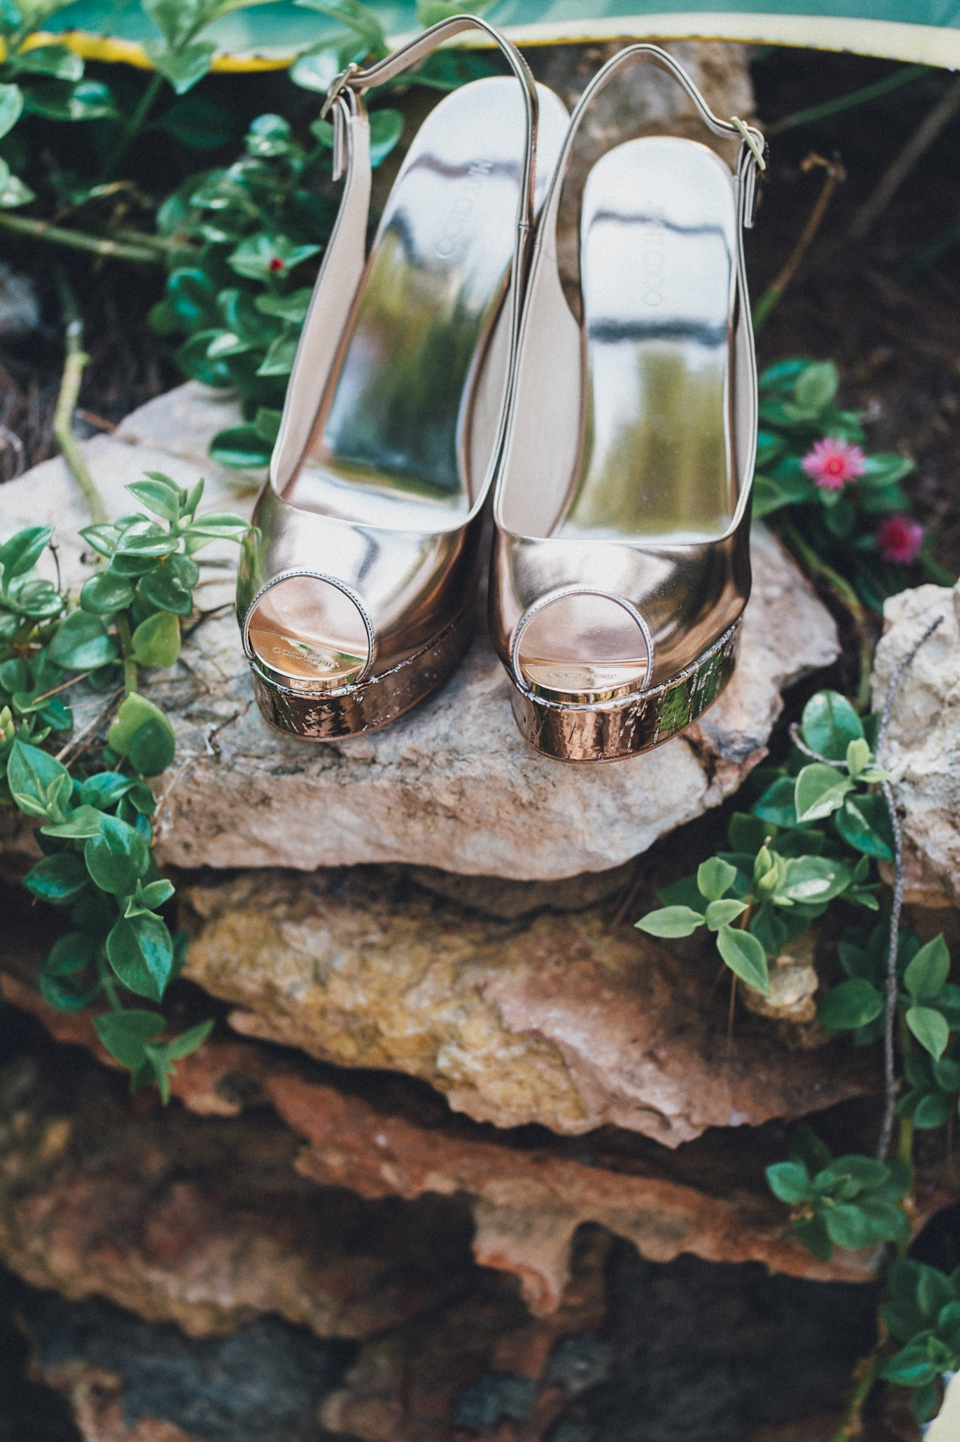 bohemian-ibiza-kreativ-wedding_0027 hochzeitsfotograf hochzeitsvideo ibiza bohemian weddingSaskia & Pierre Bohemian Bohemian Ibiza Weddingbohemian ibiza kreativ wedding 0027